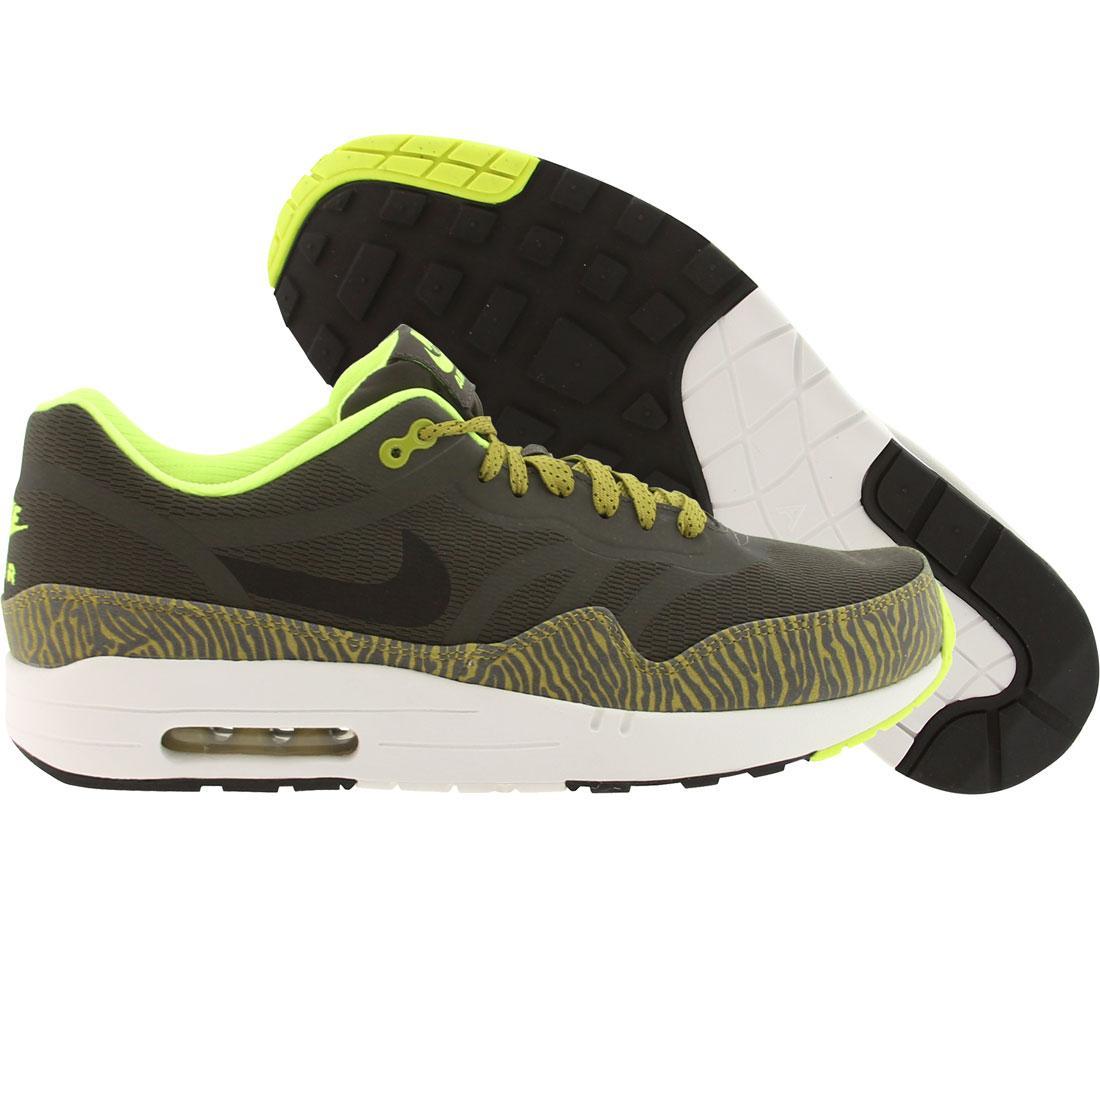 b5cbfa230611 ... 599514-007 Nike Men Air Max 1 Premium Tape Tape Tape (nwsprnt   black  ...